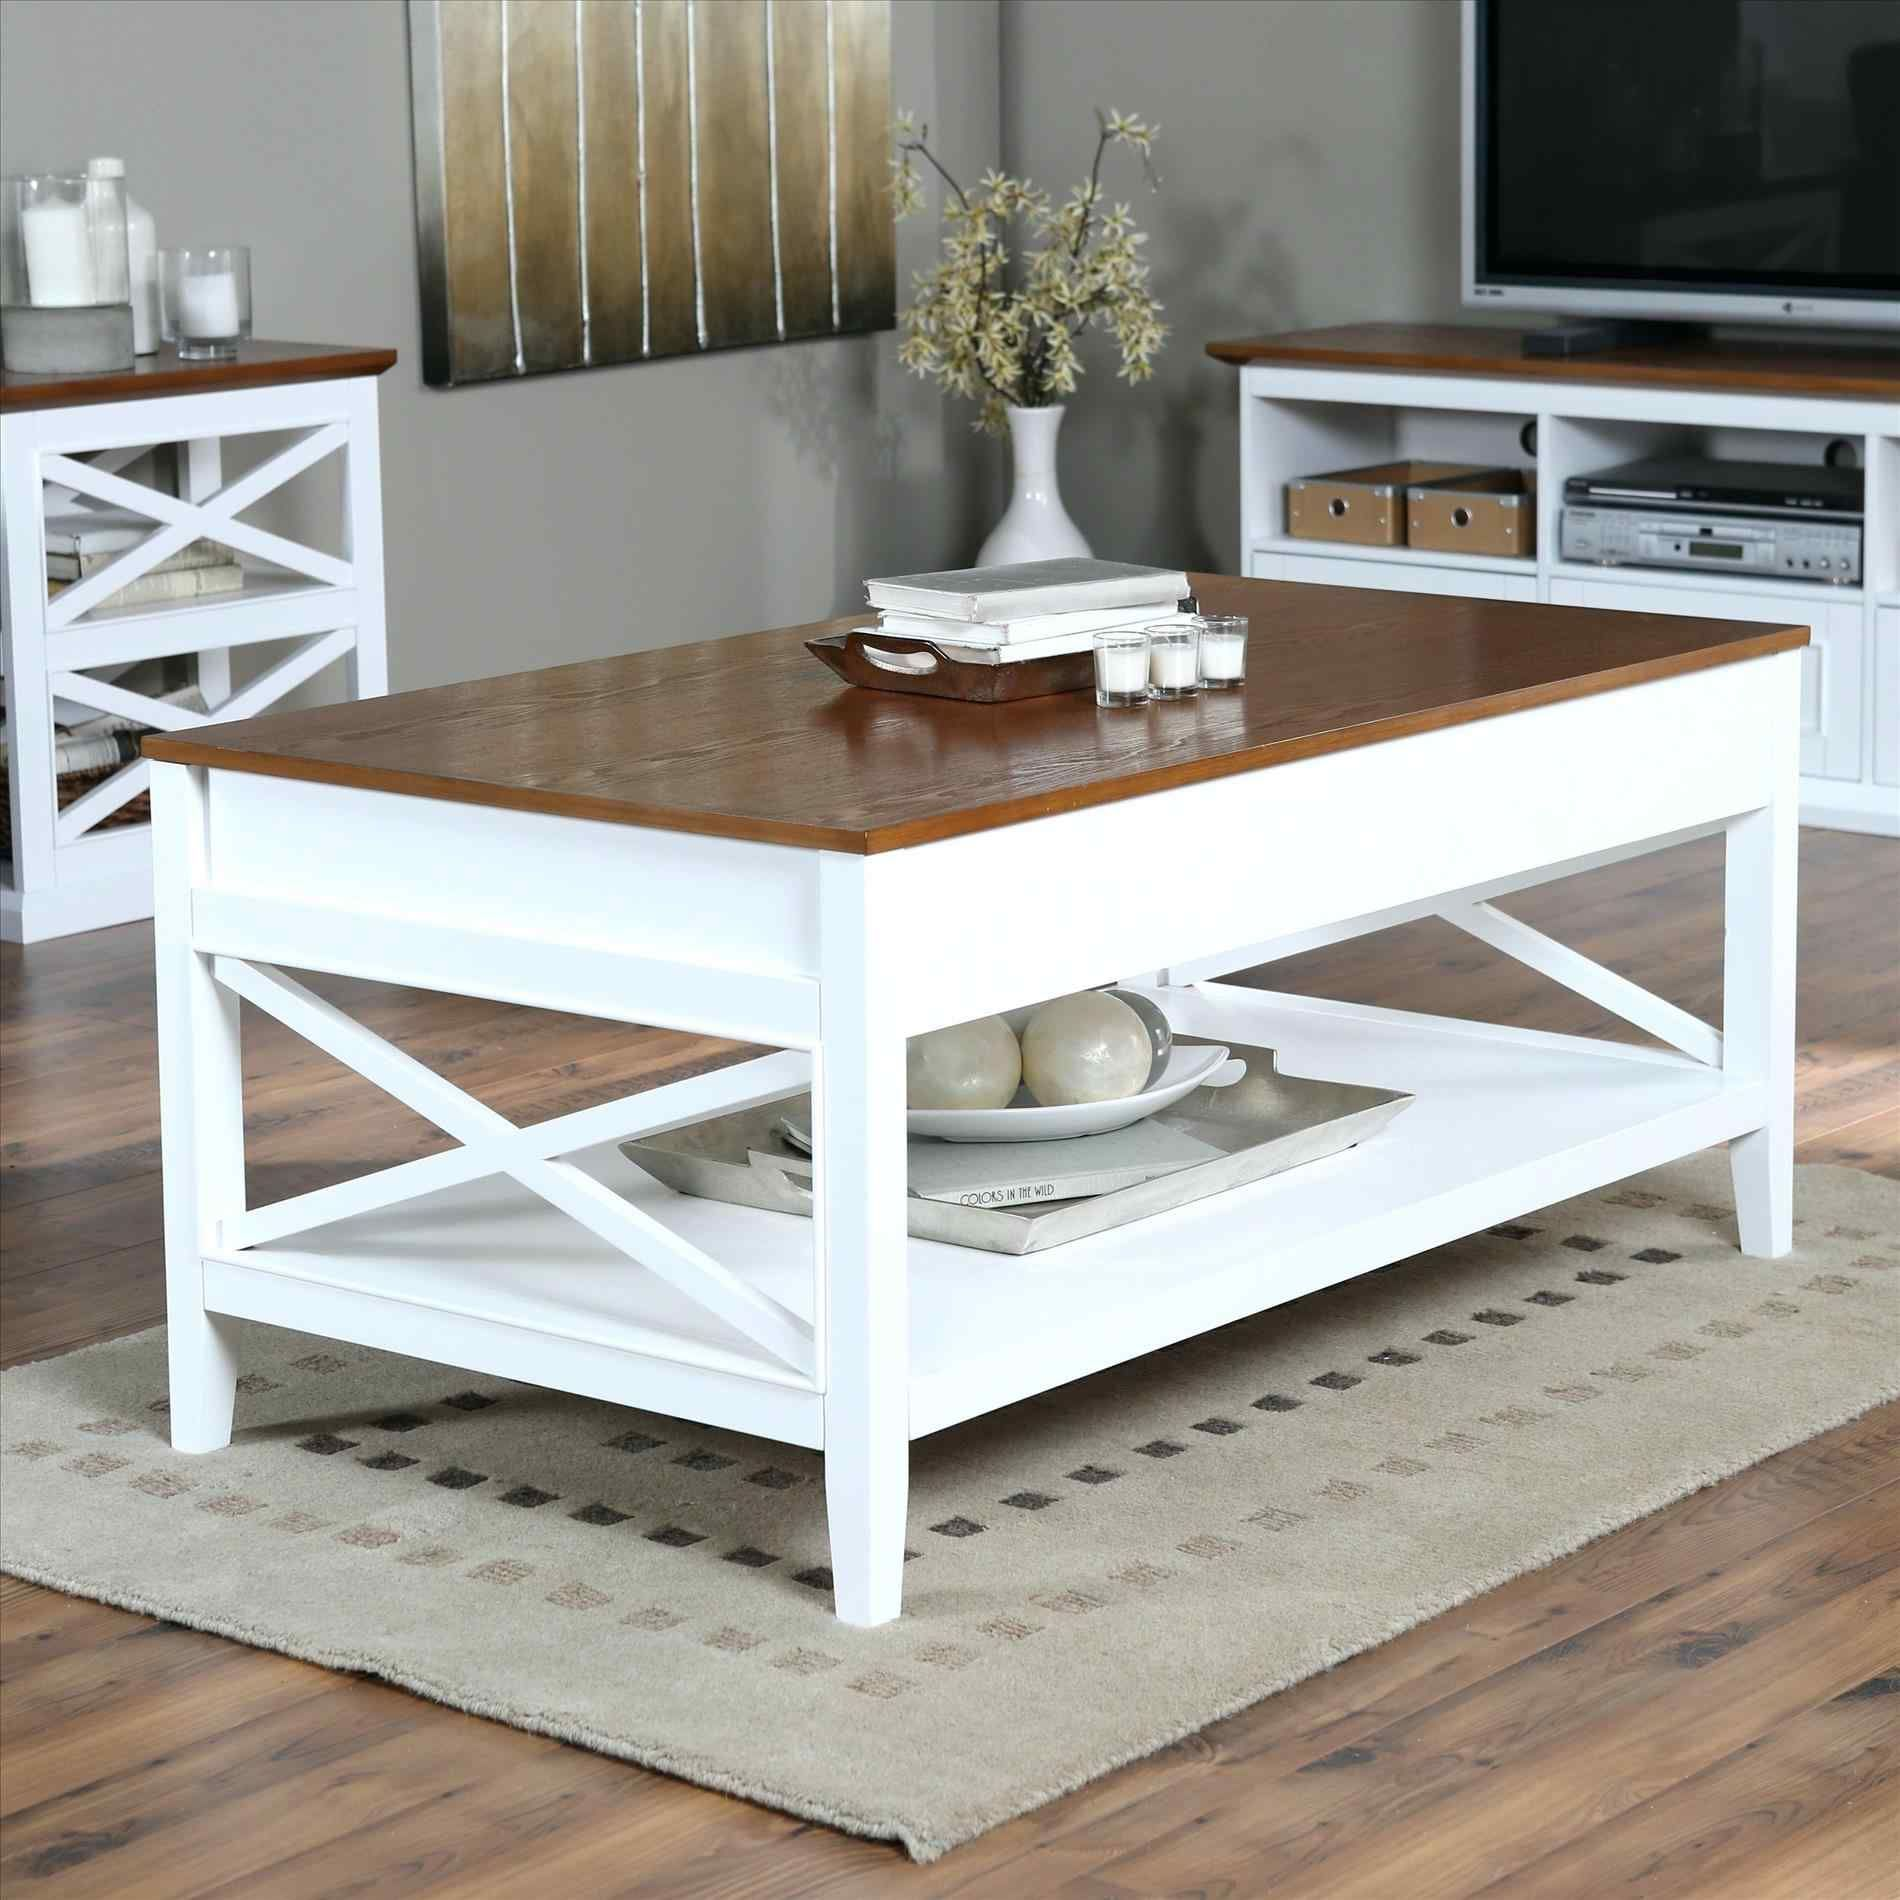 Amazing And Beautiful Barn Style Coffee Table Ideas Barn